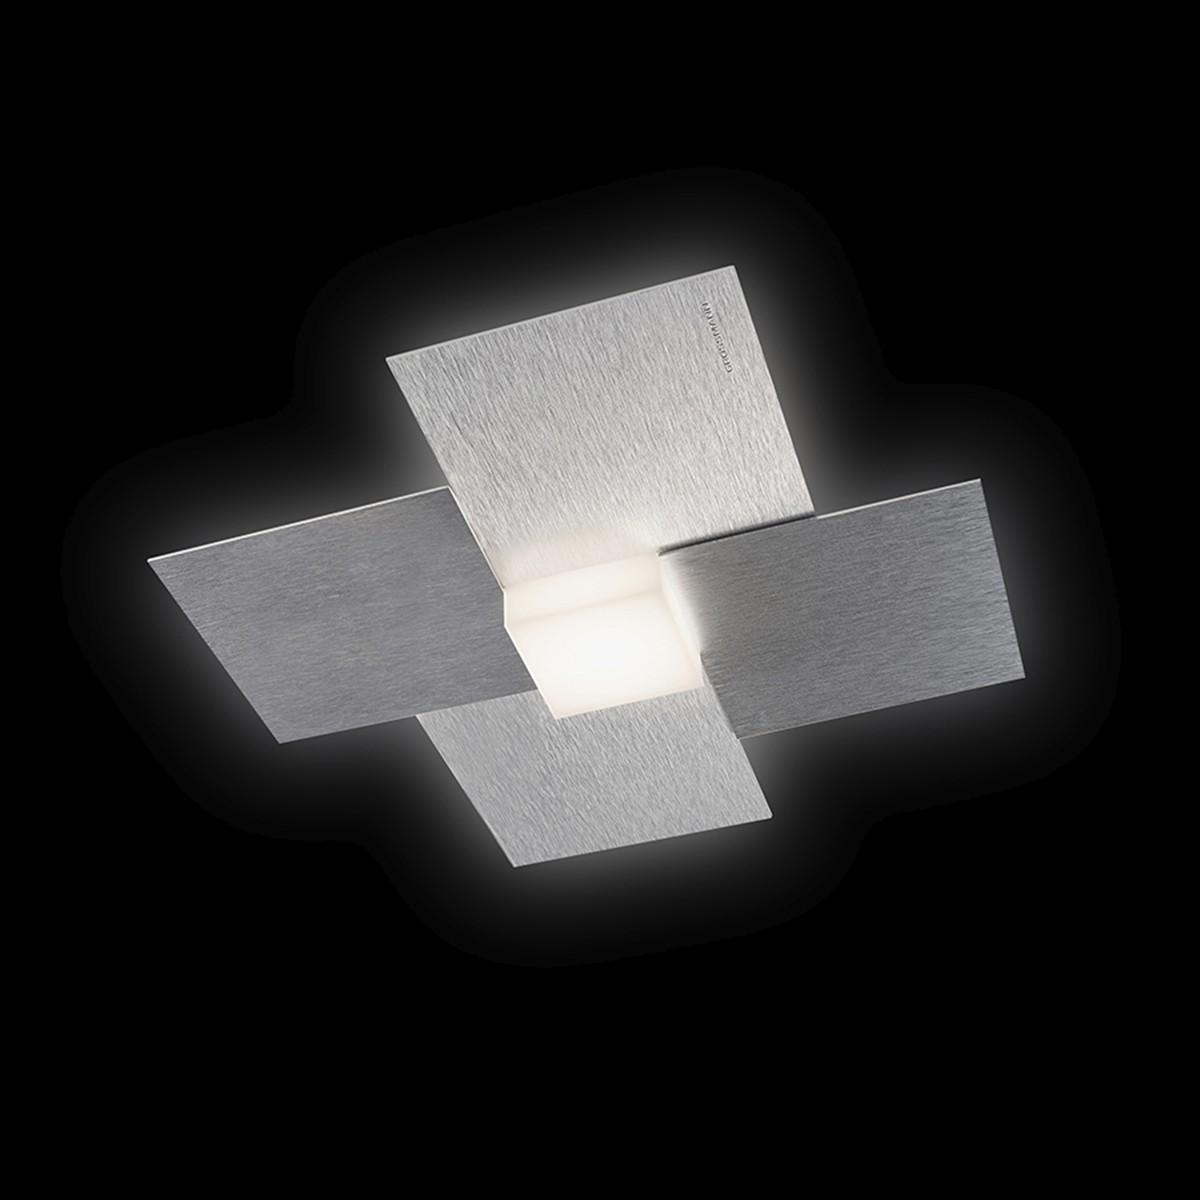 Grossmann Creo LED Wand- / Deckenleuchte, Alu gebürstet, 27,5 x 27,5 cm